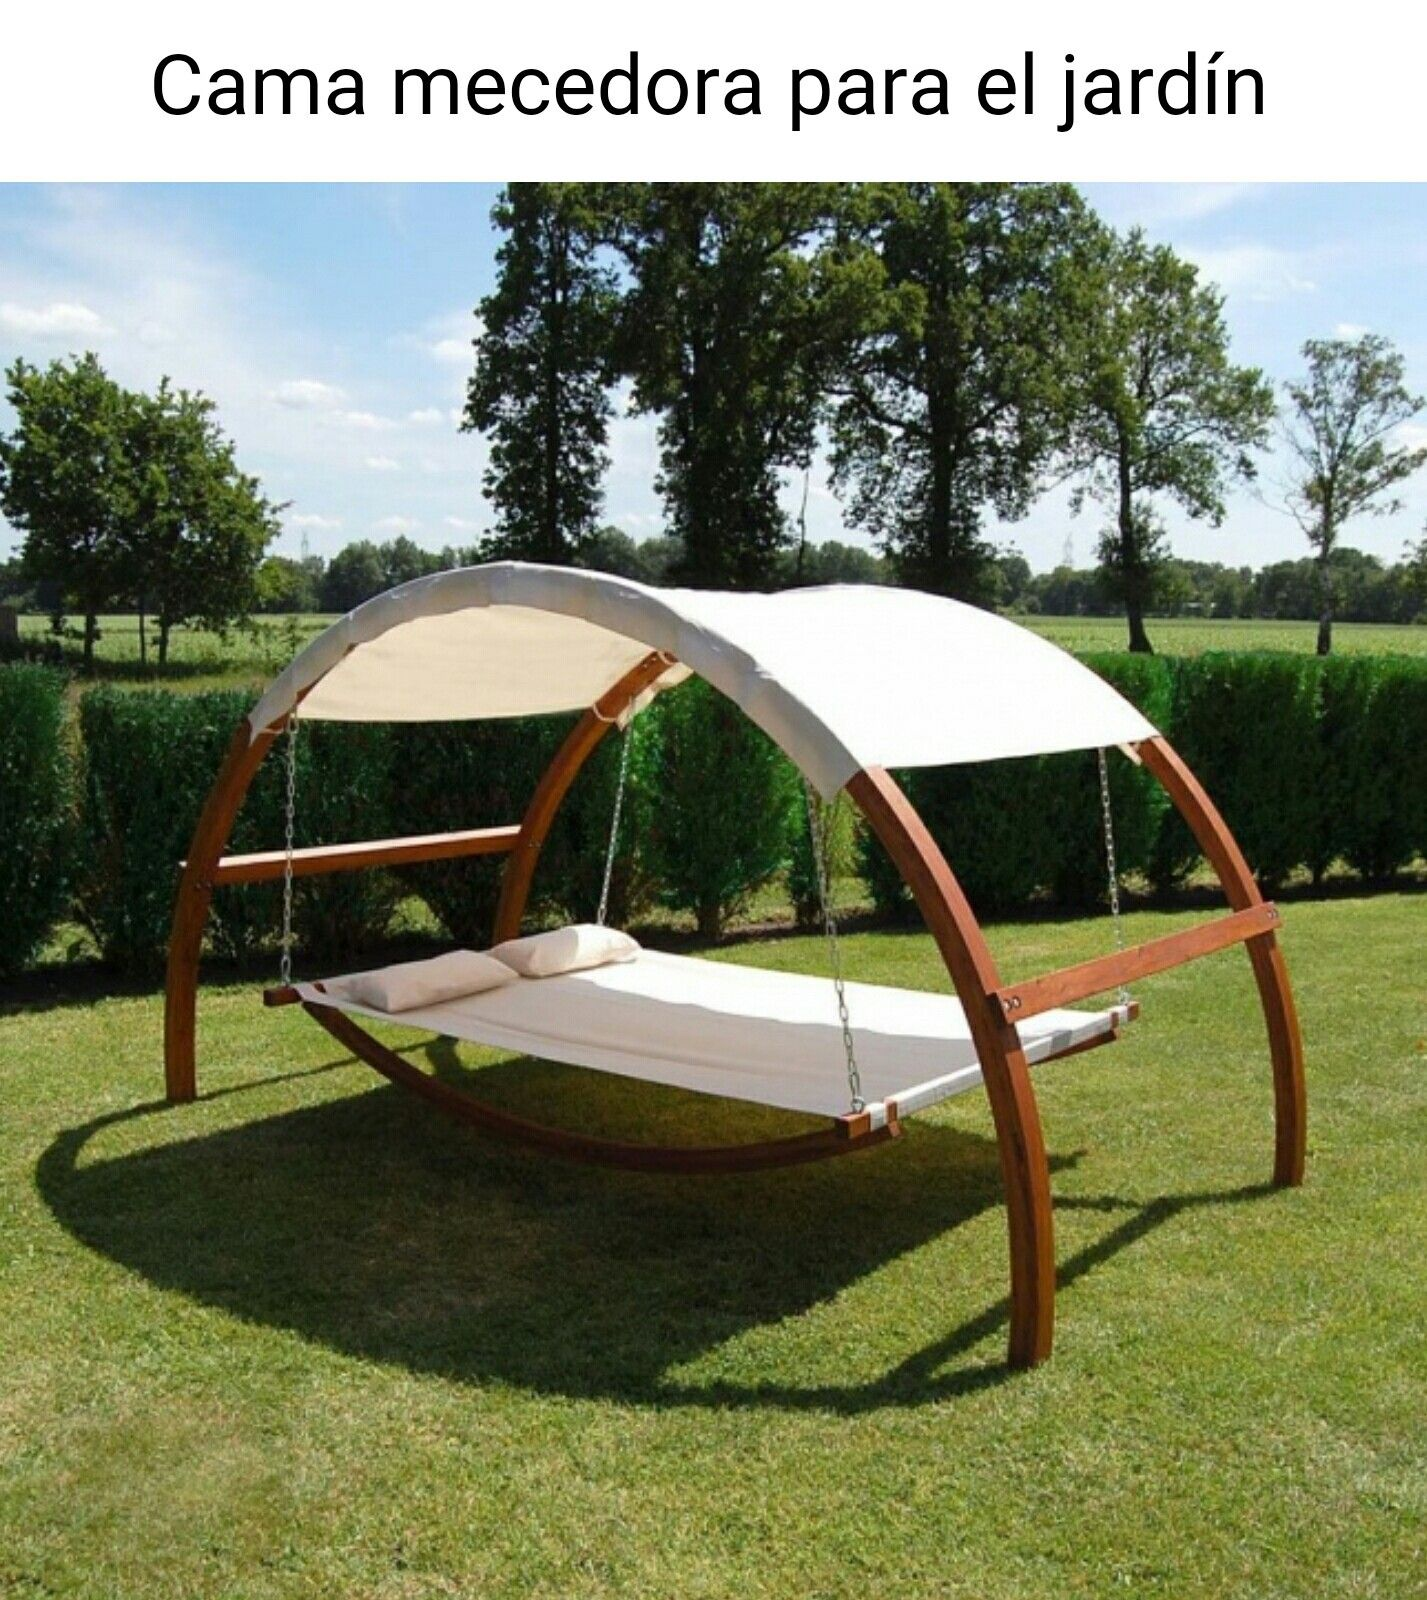 Mecedora de jardin | jardines | Pinterest | Mecedora, Jardín y ...